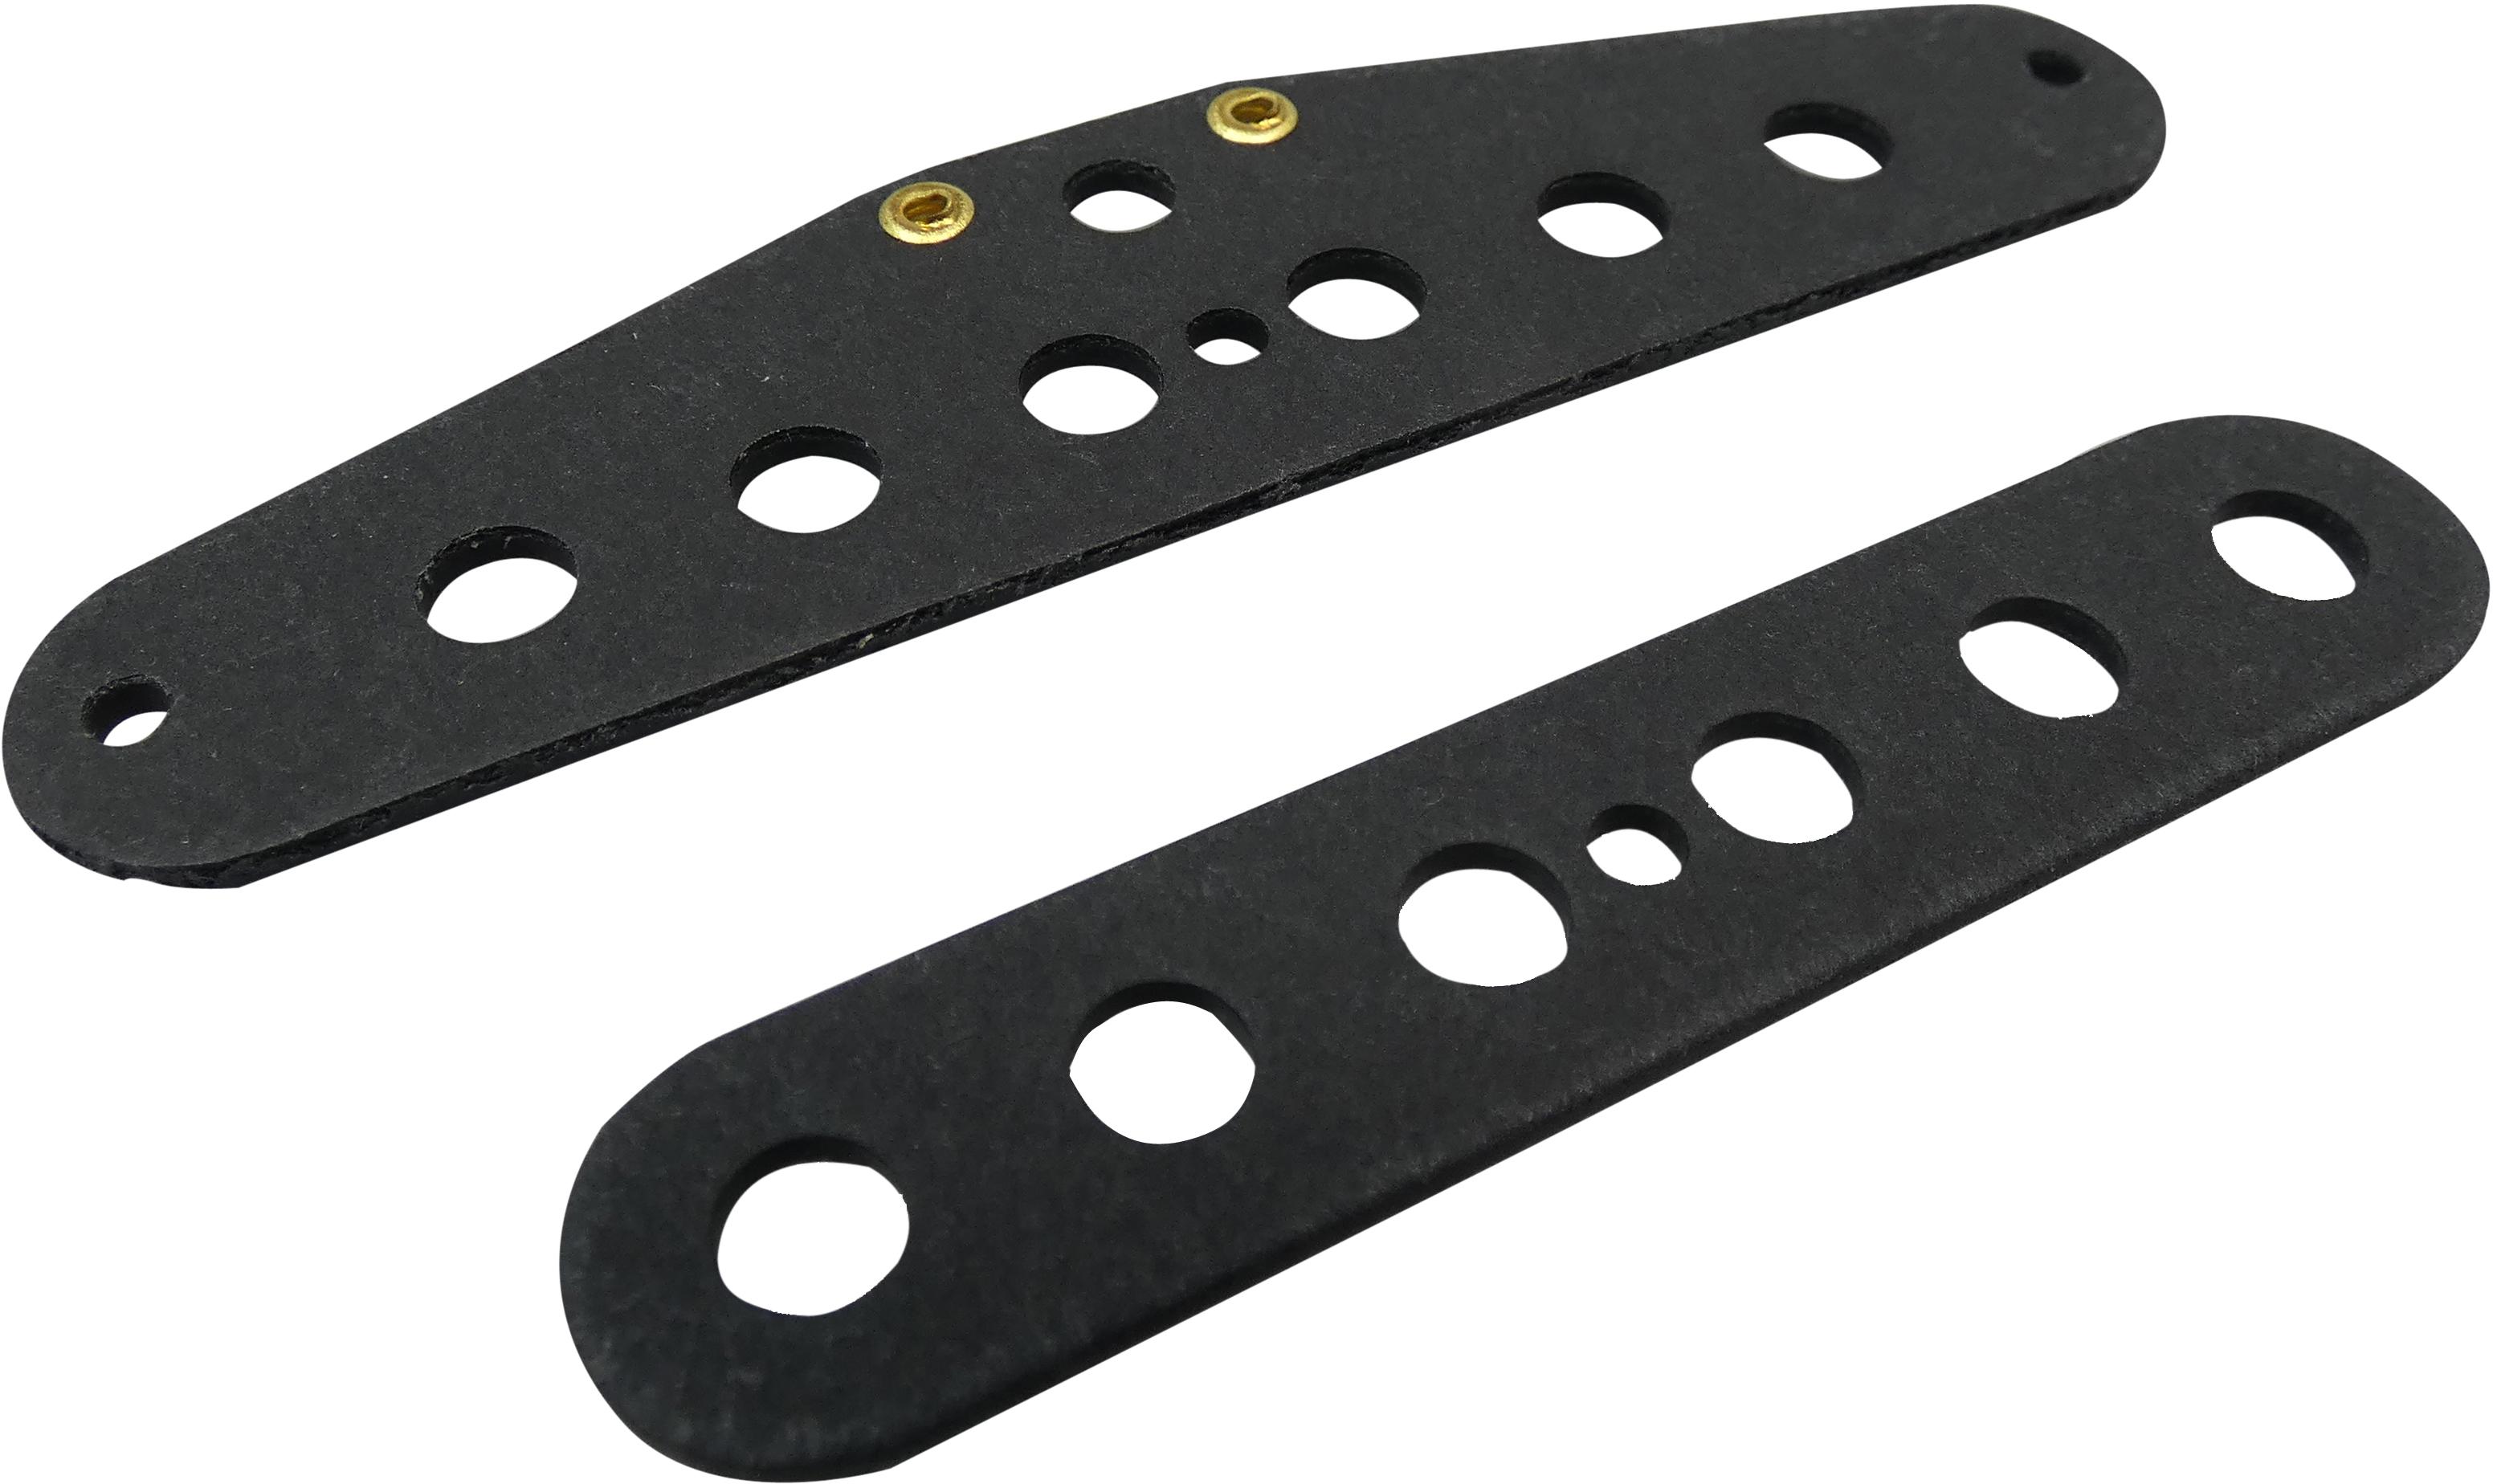 Tele Neck Pickup Flat Set